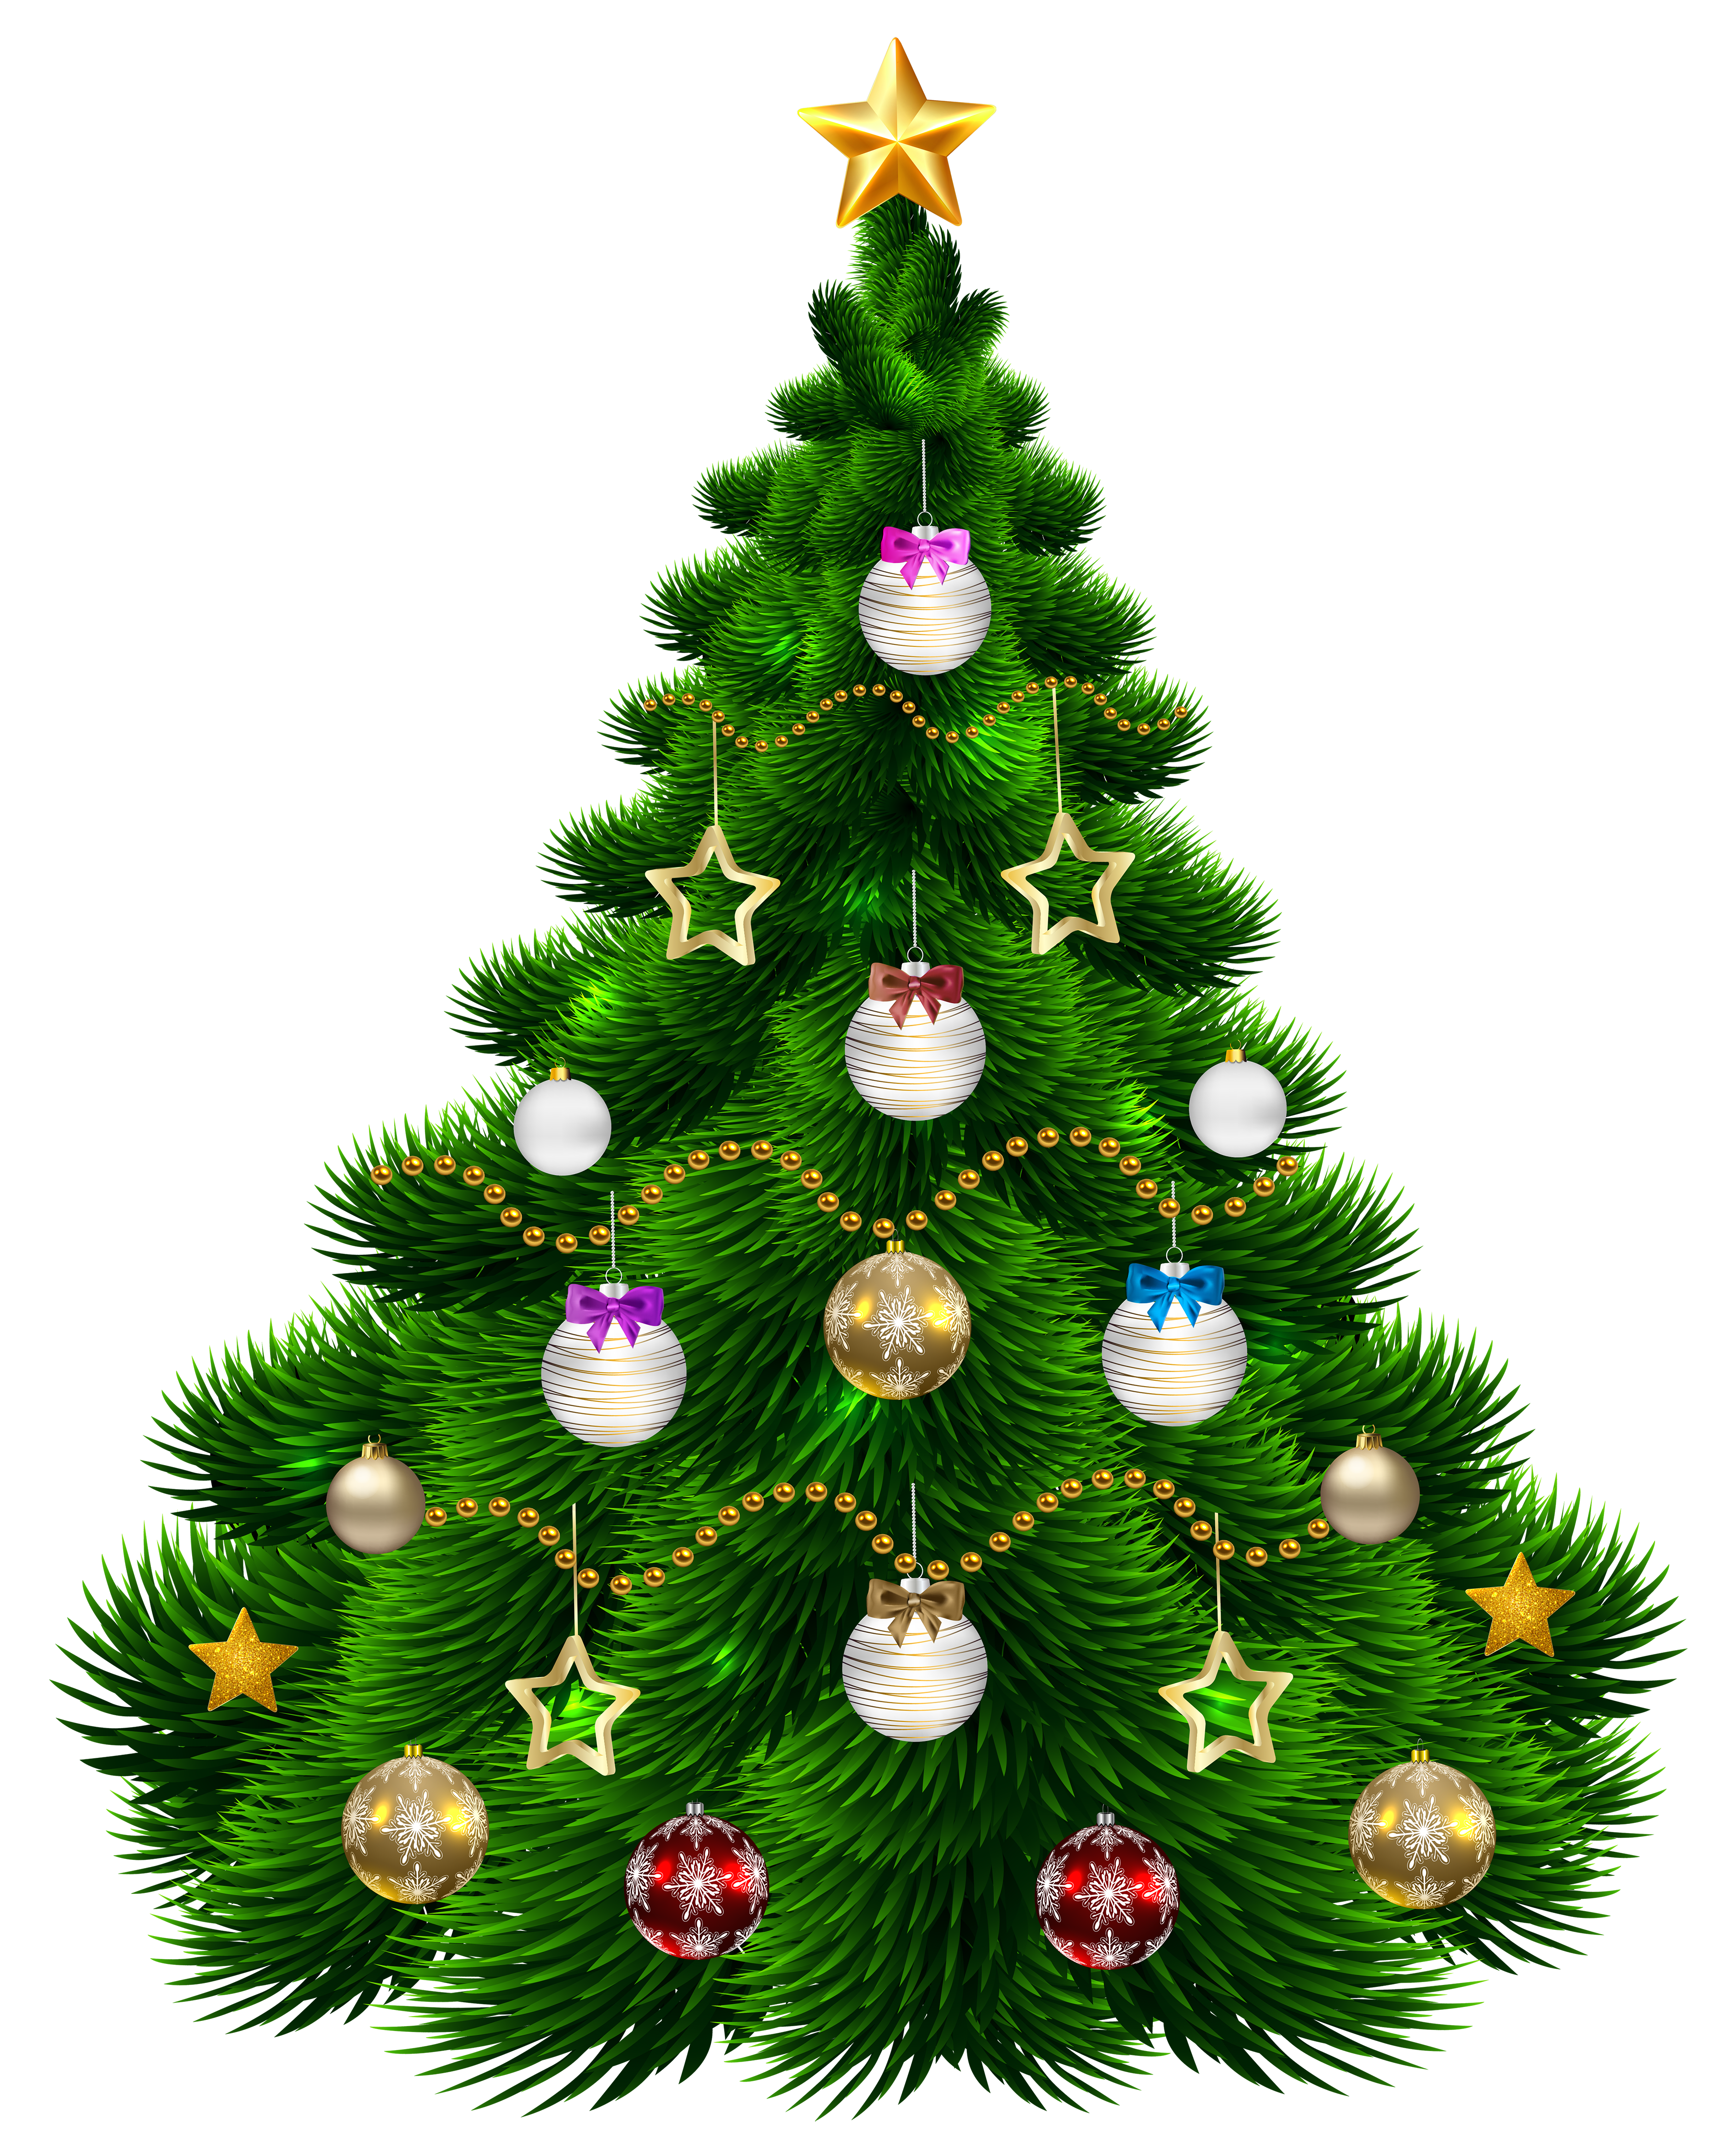 Beautiful christmas star clipart clipart royalty free library Beautiful Christmas Tree with Ornaments PNG Clip-Art Image ... clipart royalty free library